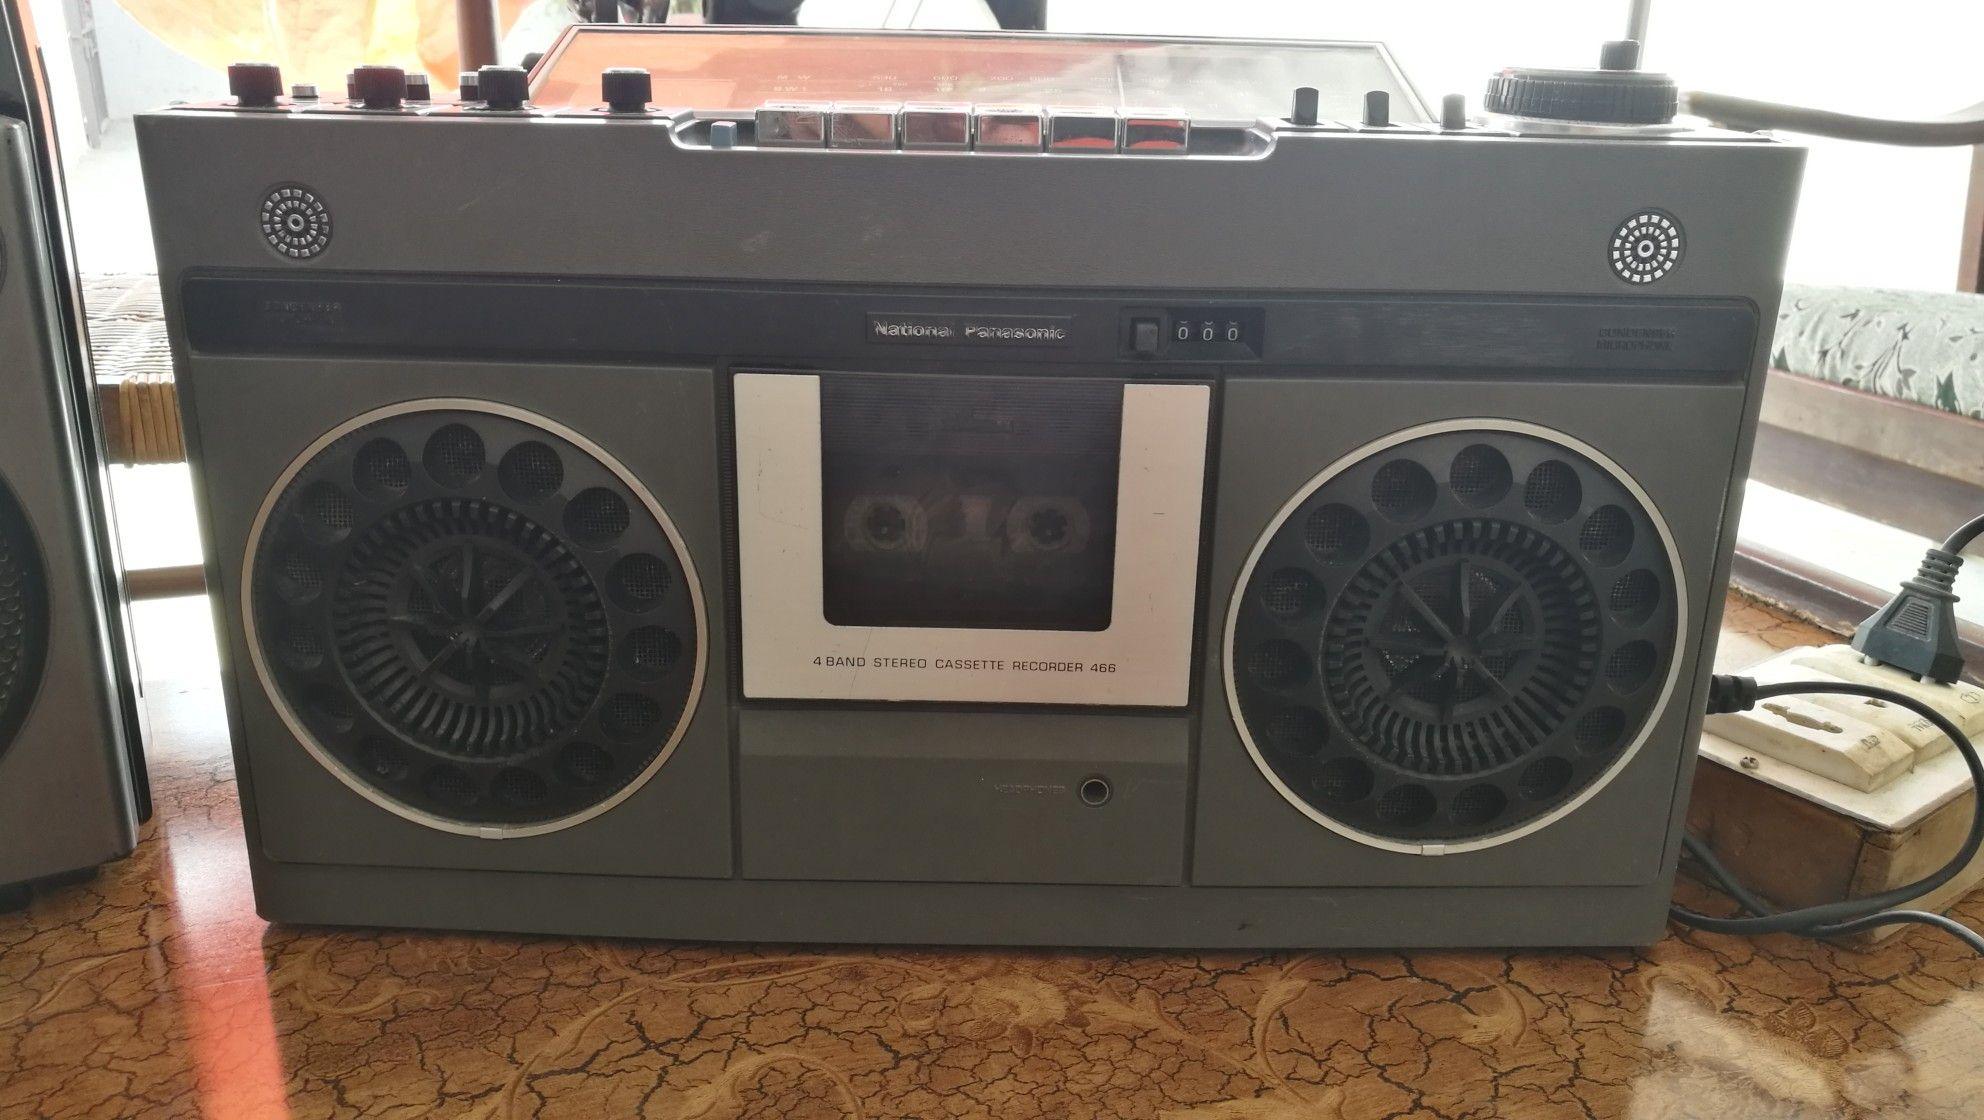 National Panasonic Audio System Home Appliances Washing Machine